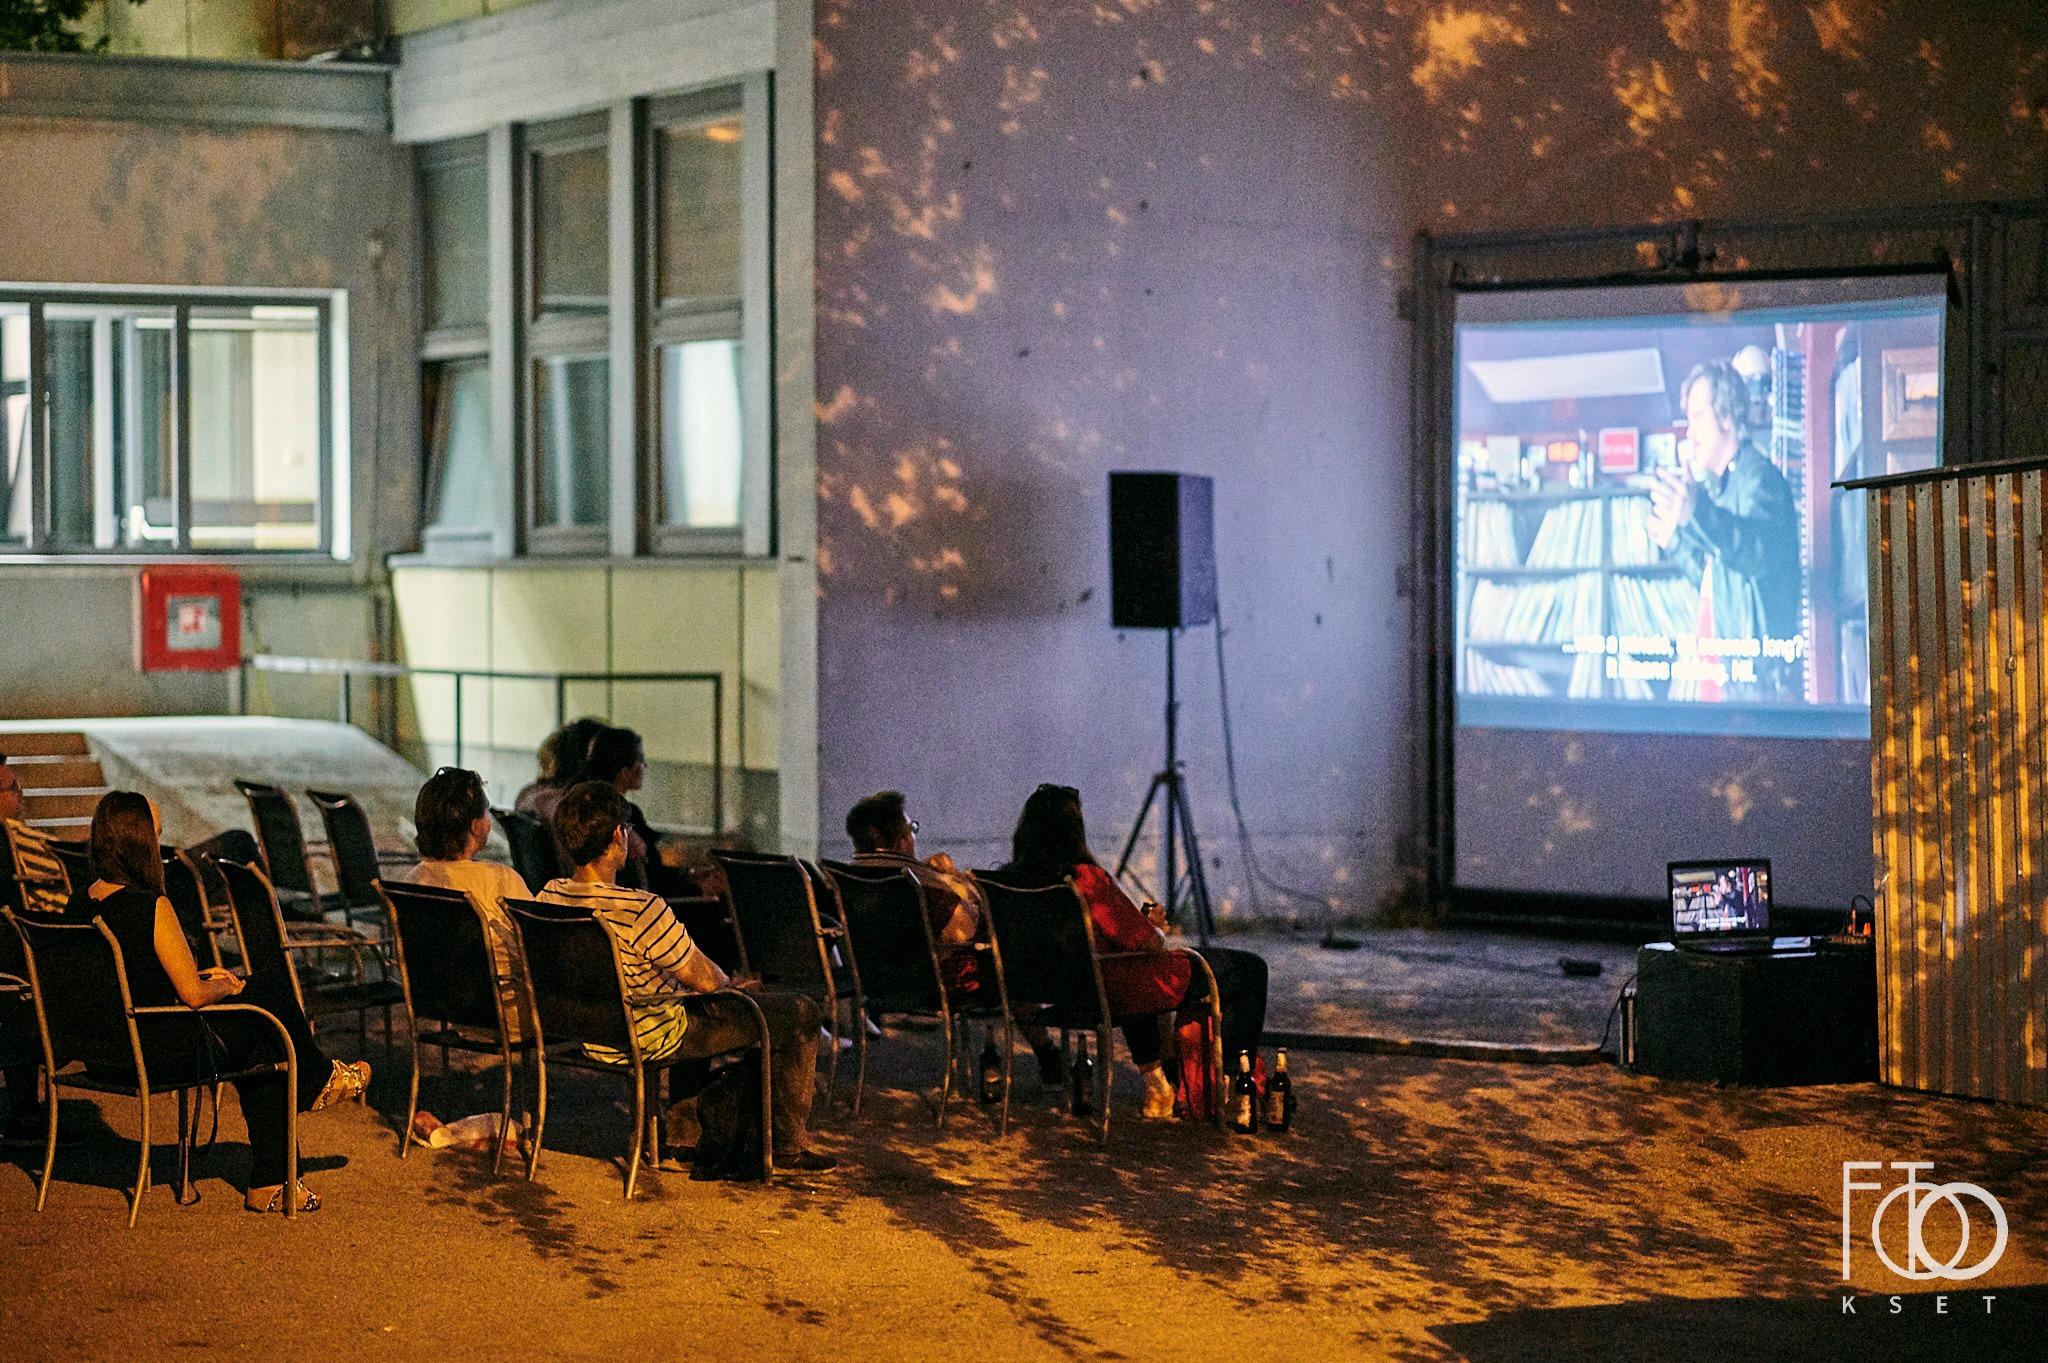 Videosekcija KSET-a kino